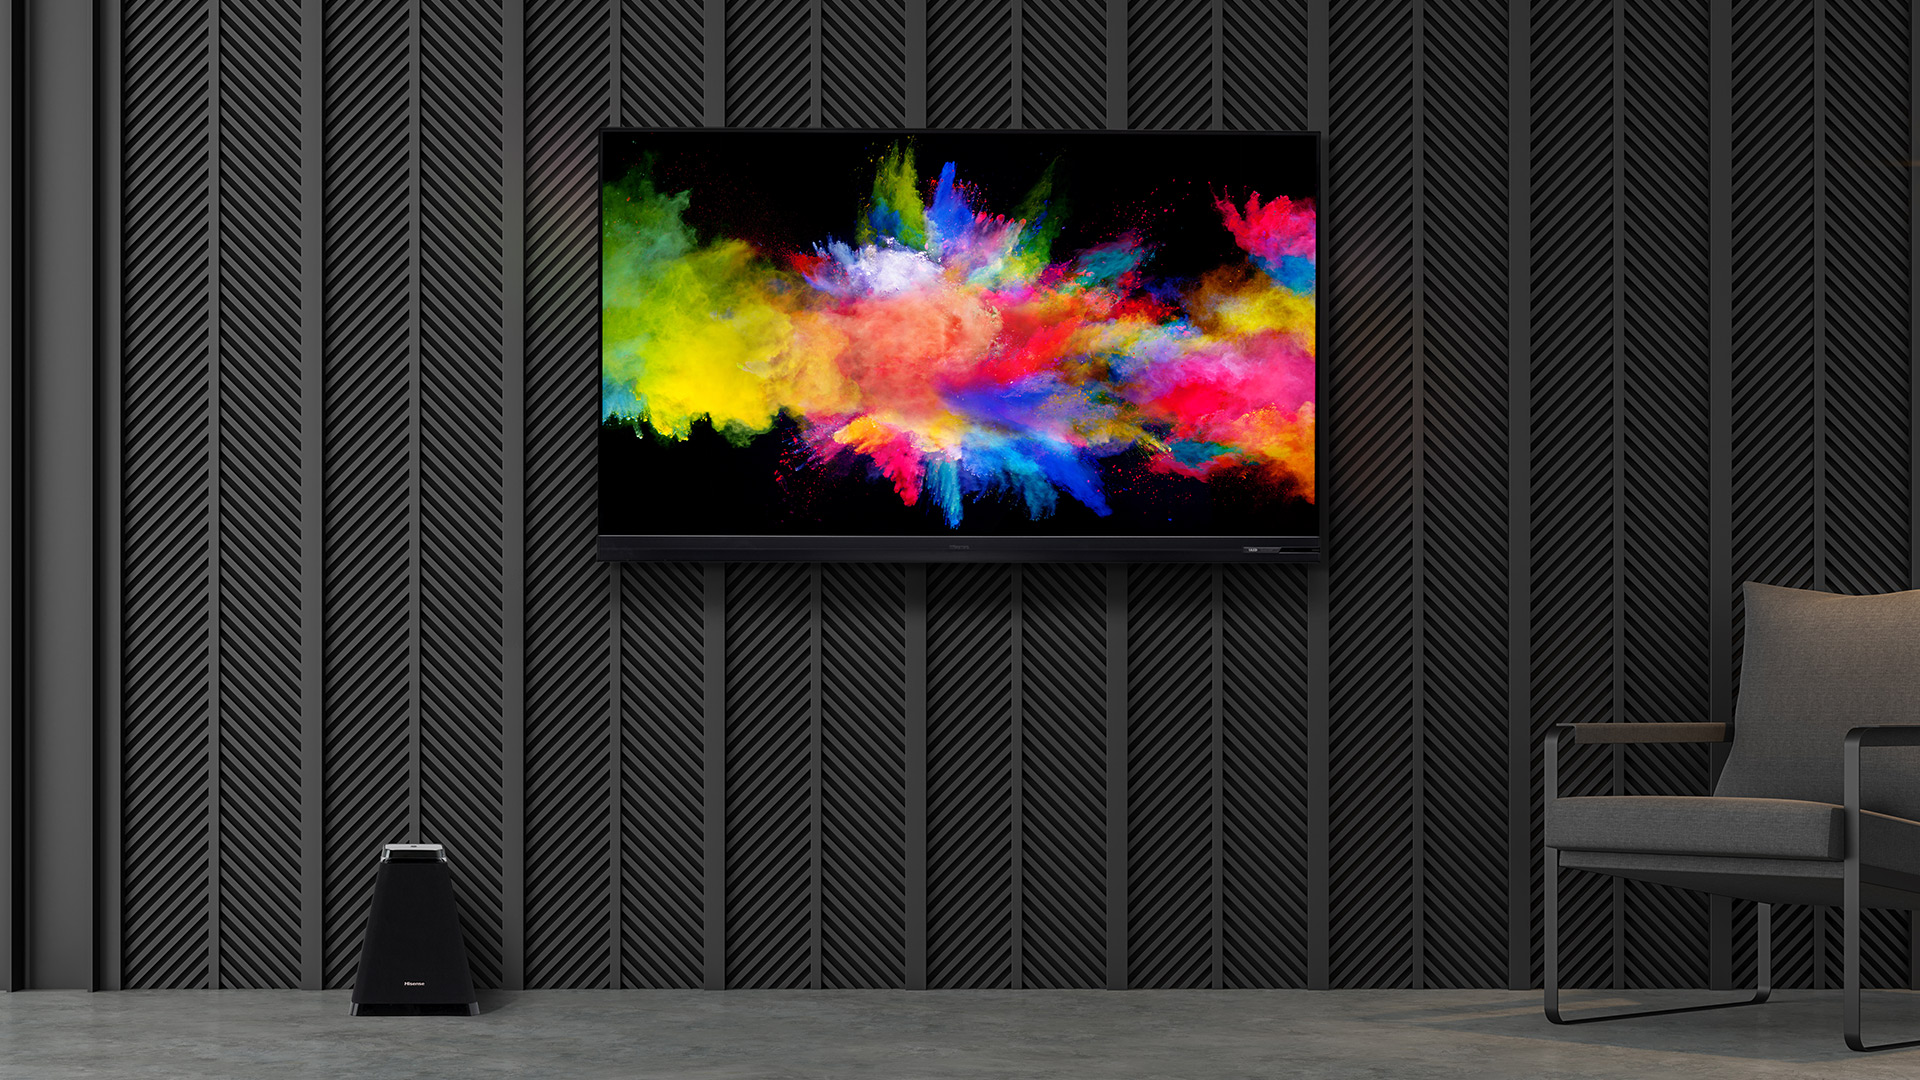 Hisense Dual Cell TV